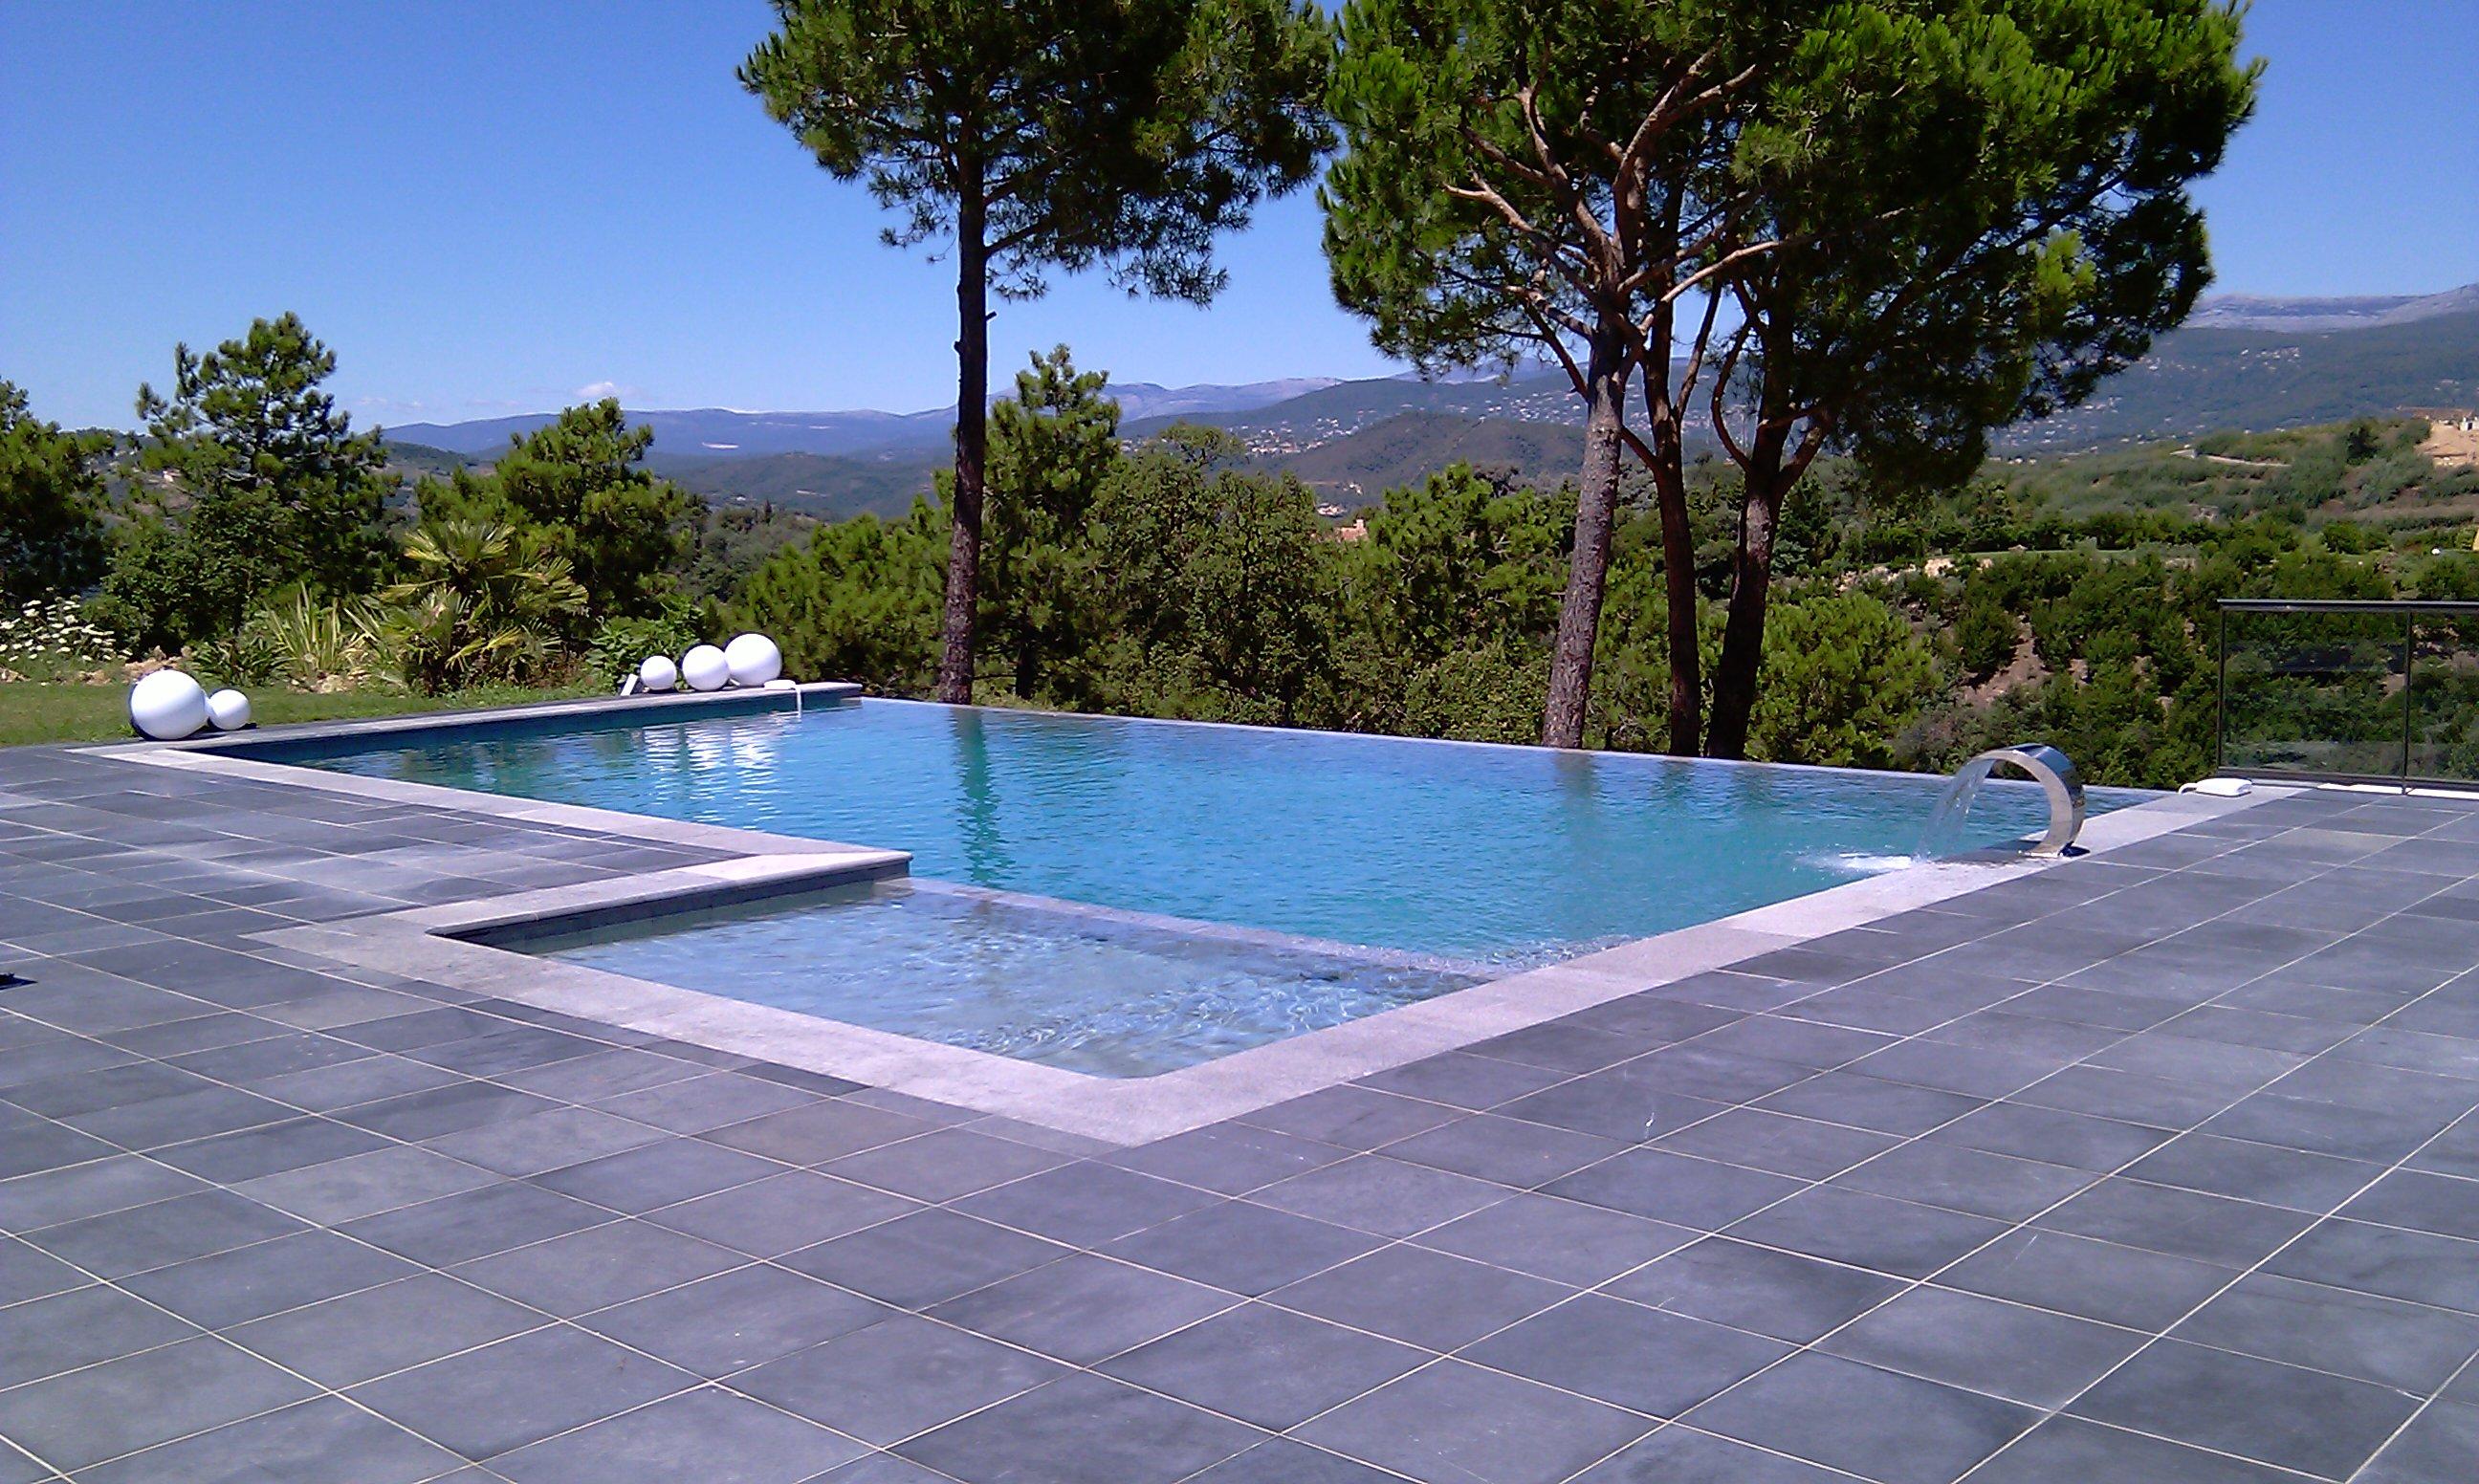 Materiel Piscine La Ciotat jac' clean piscines - entretien & construction de piscines